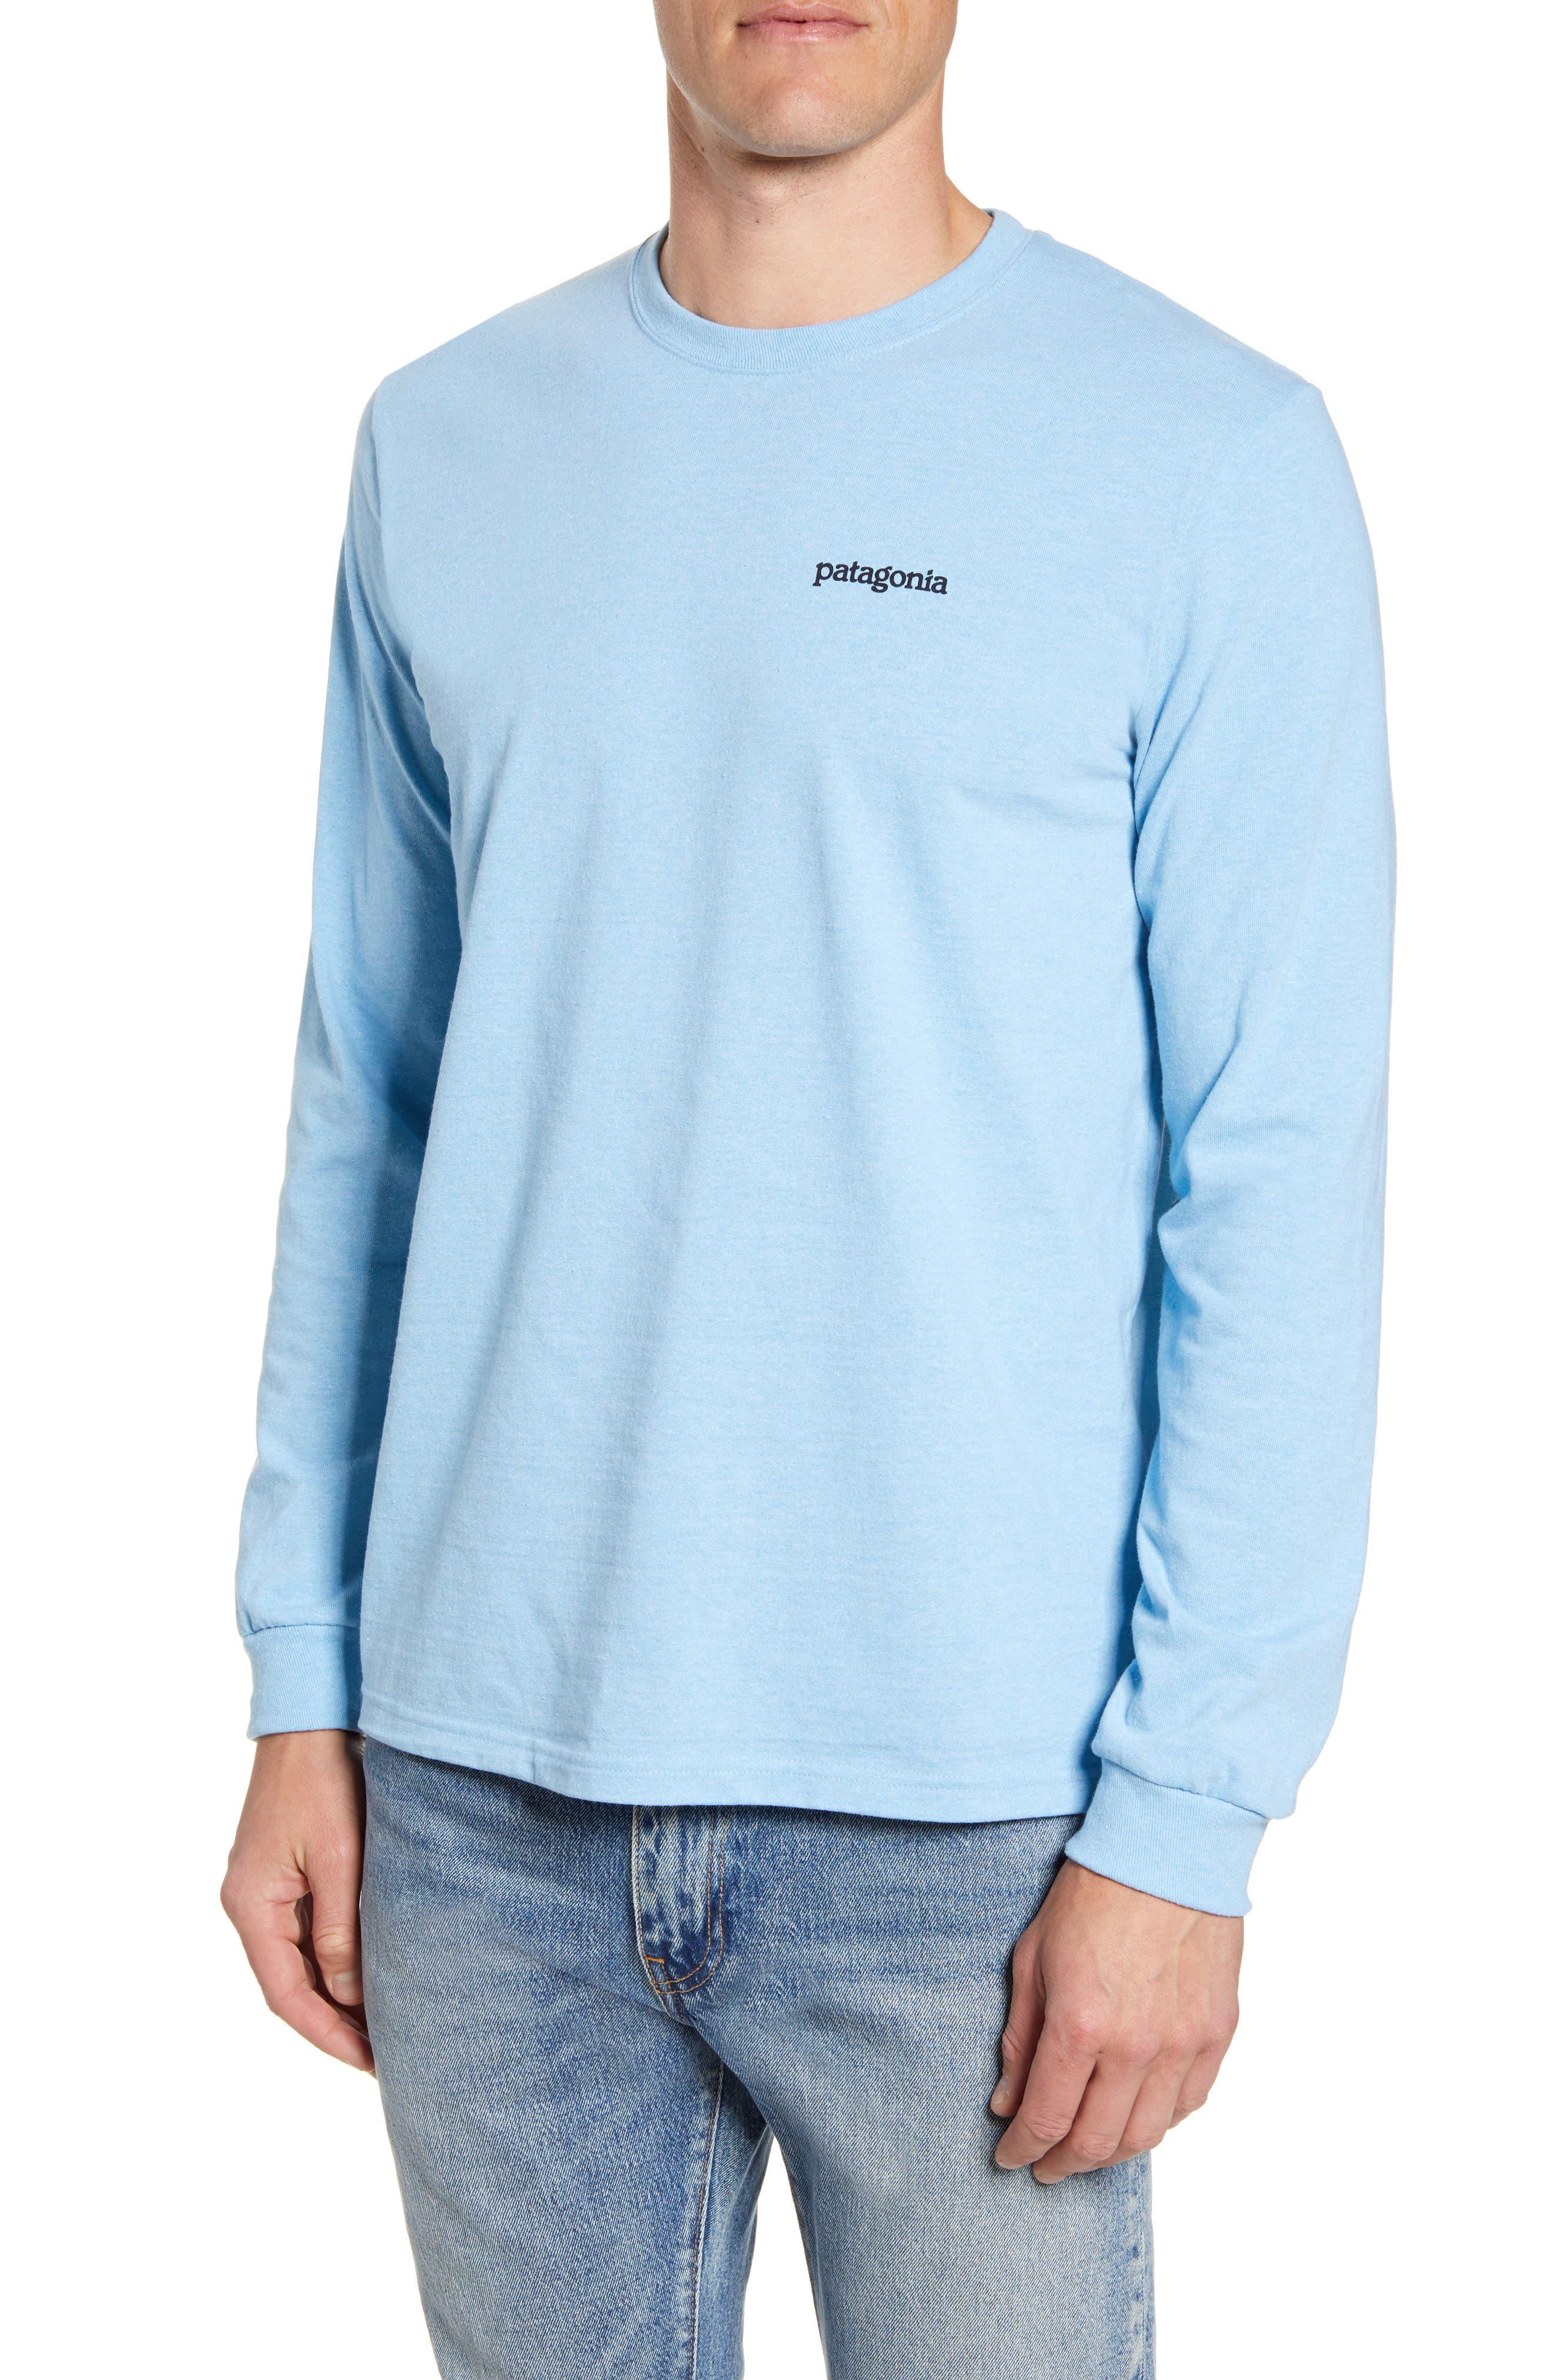 Patagonia Fitz Roy Horizons Graphic Long Sleeve Responsibili-Tee T-Shirt, Blue